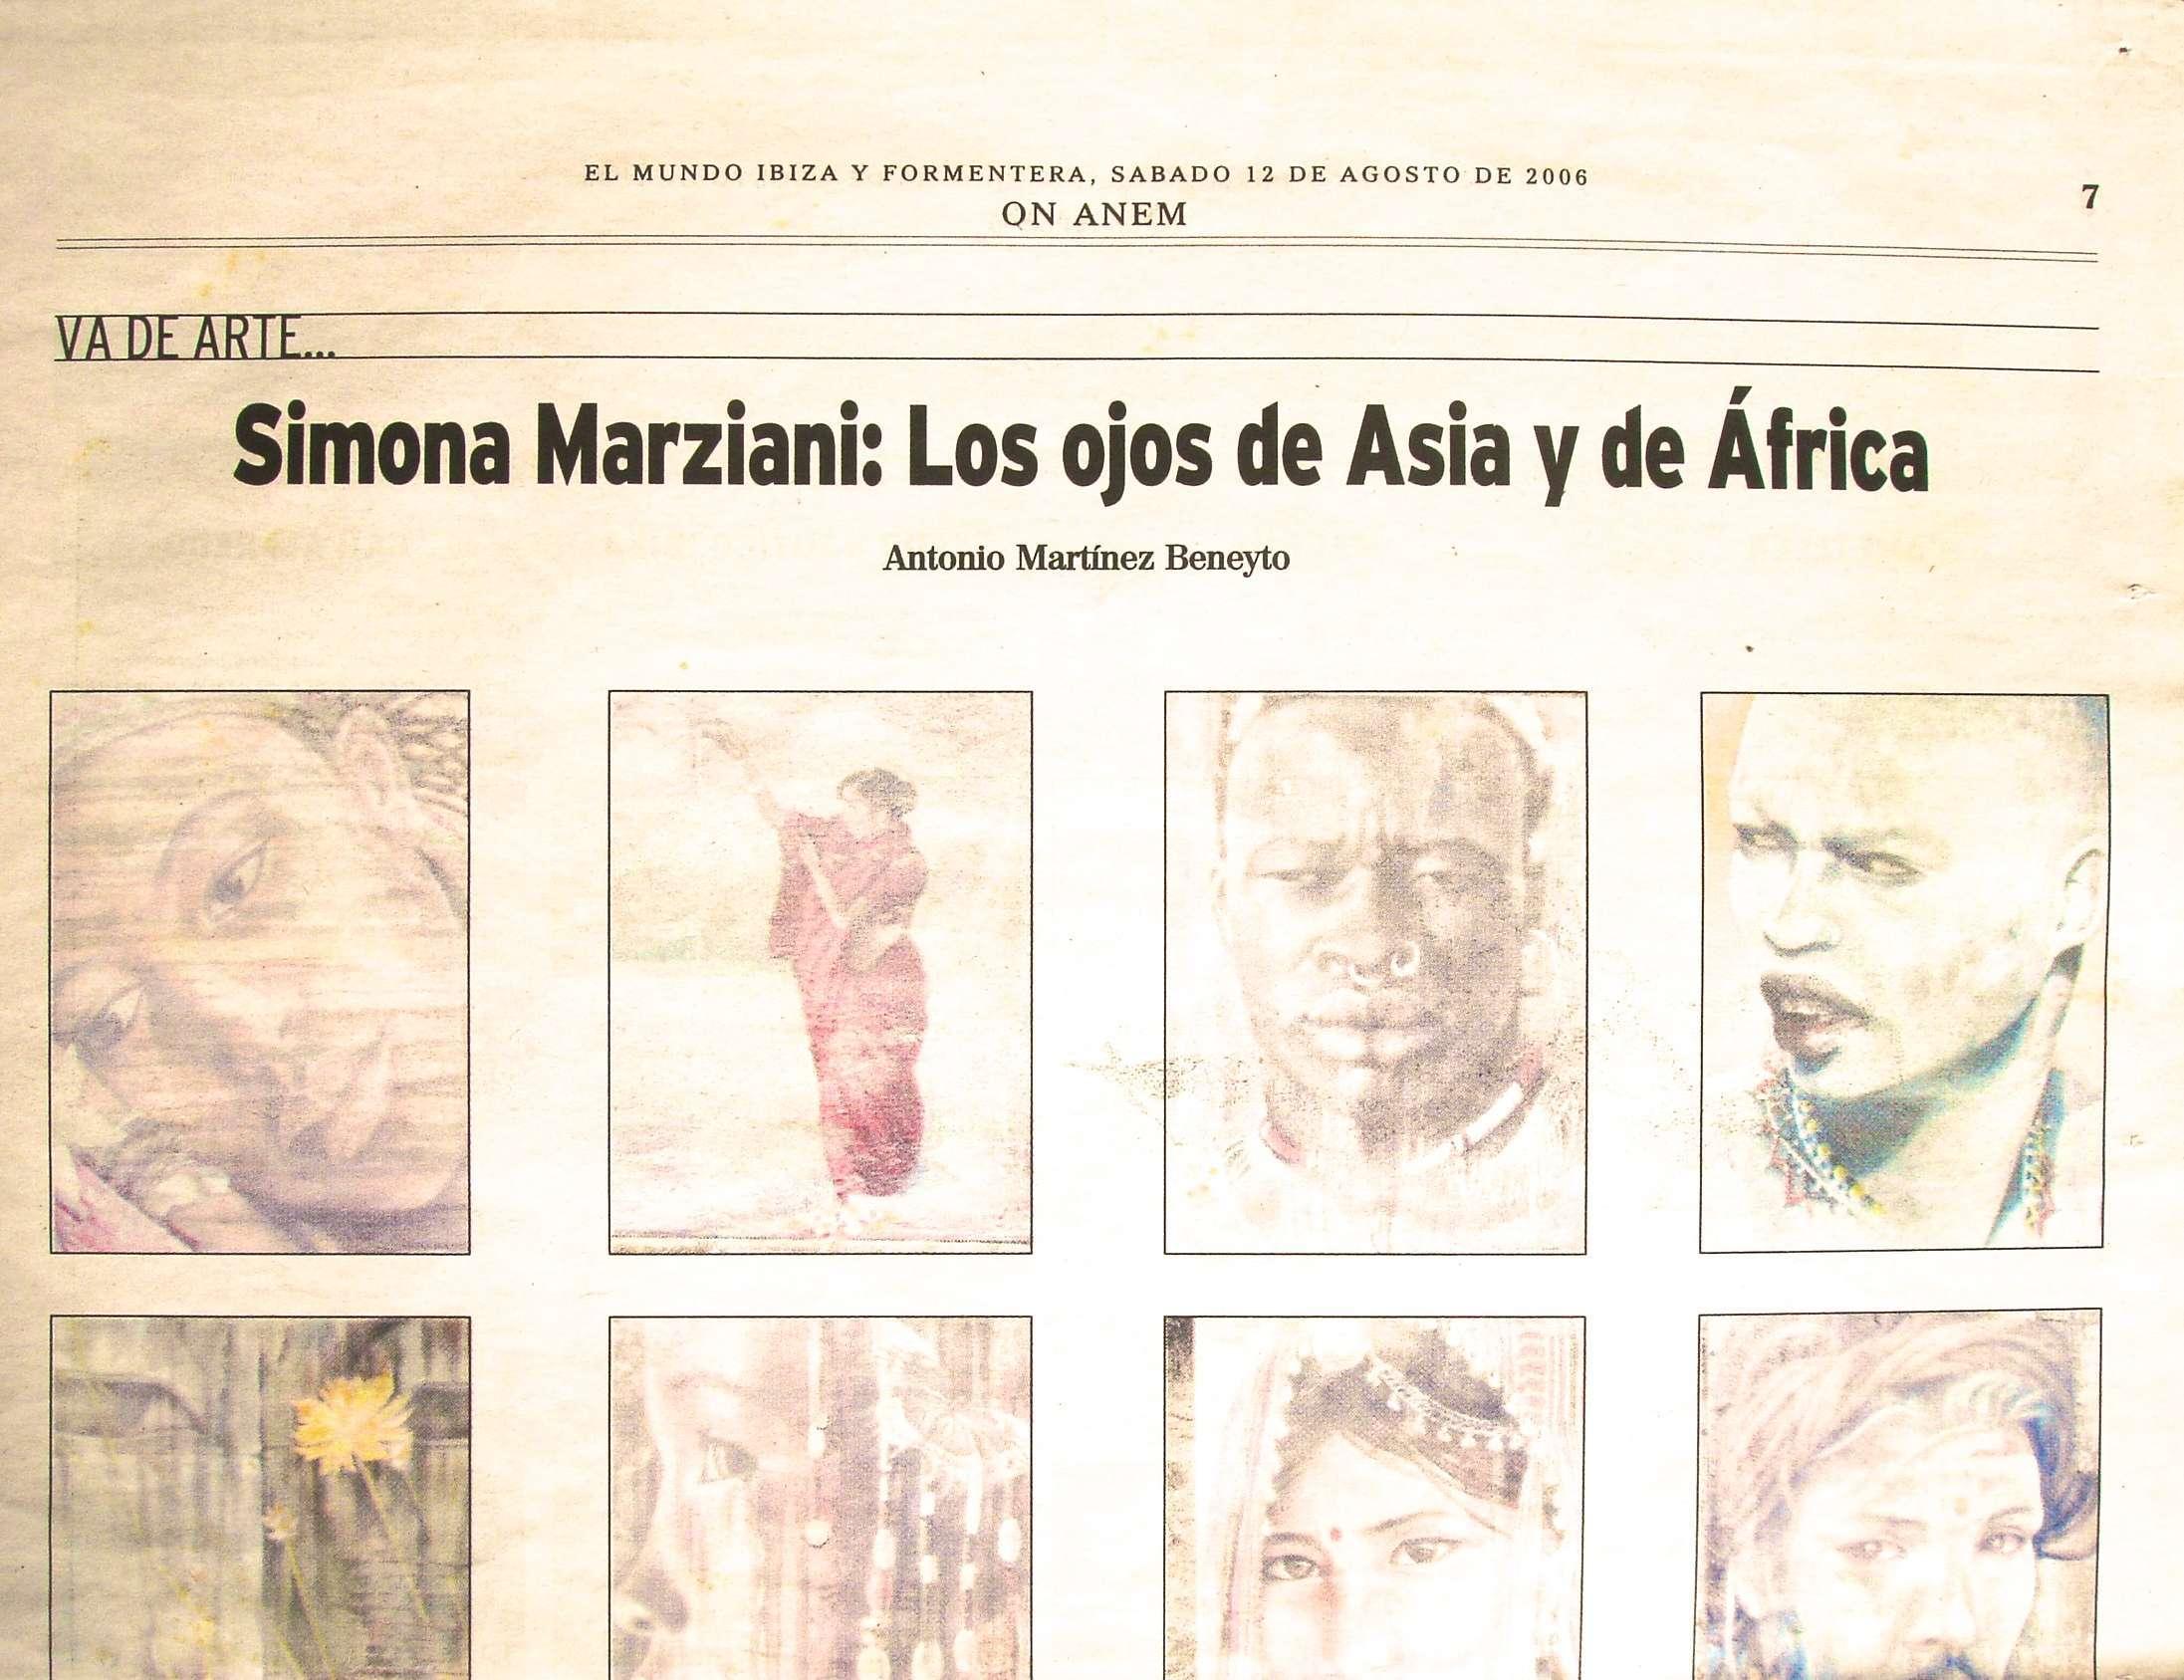 Press Ibiza - SIMONA MARZIANI